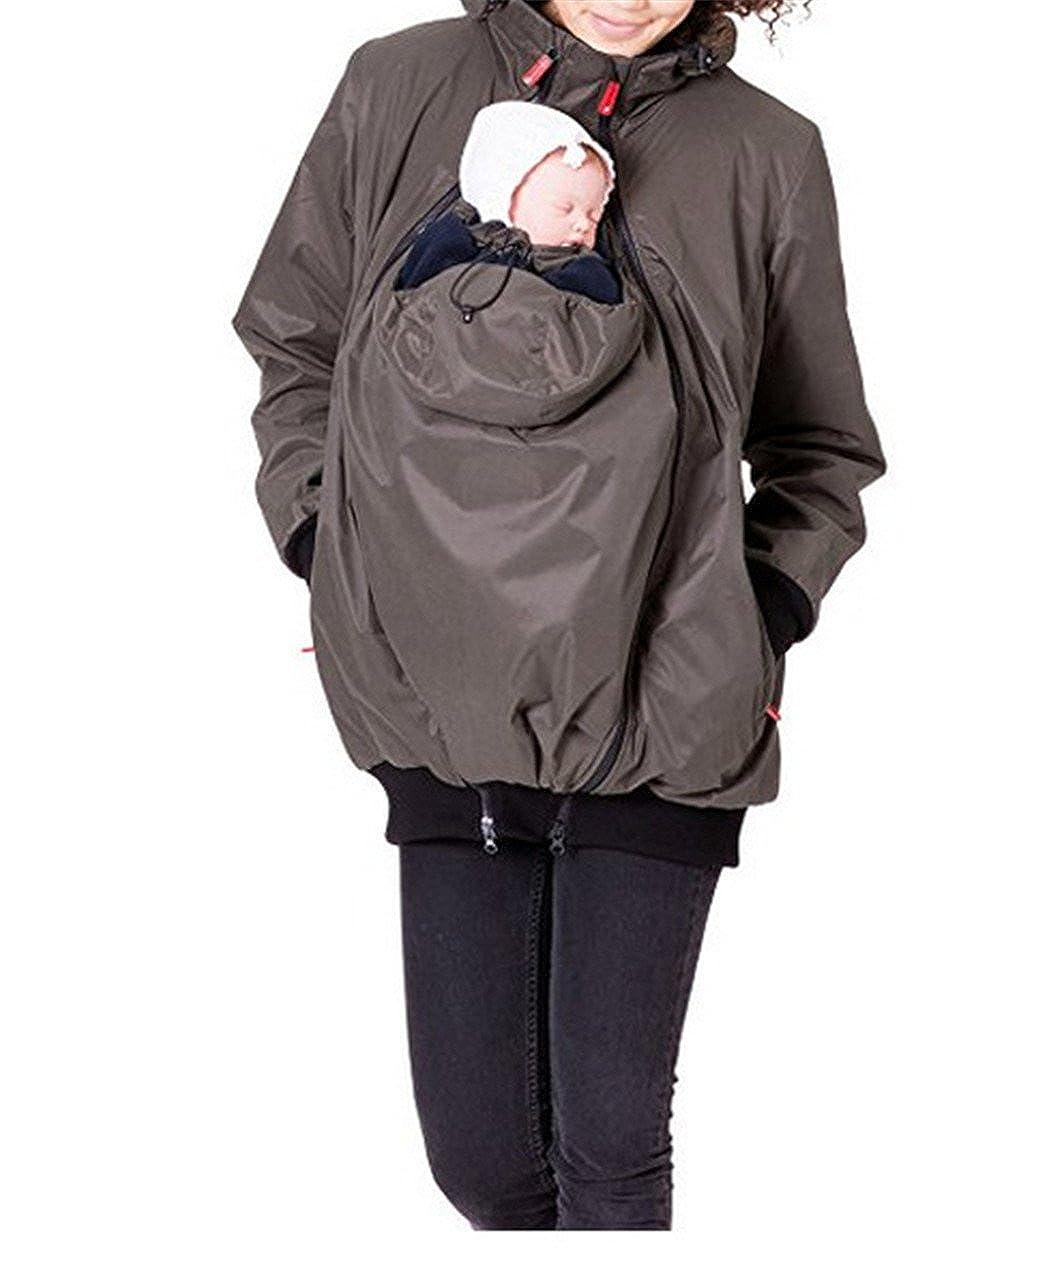 Moxeay Unisex Hoodie Maternity Outerwear Coat Kangaroo Jacket Baby Carrier